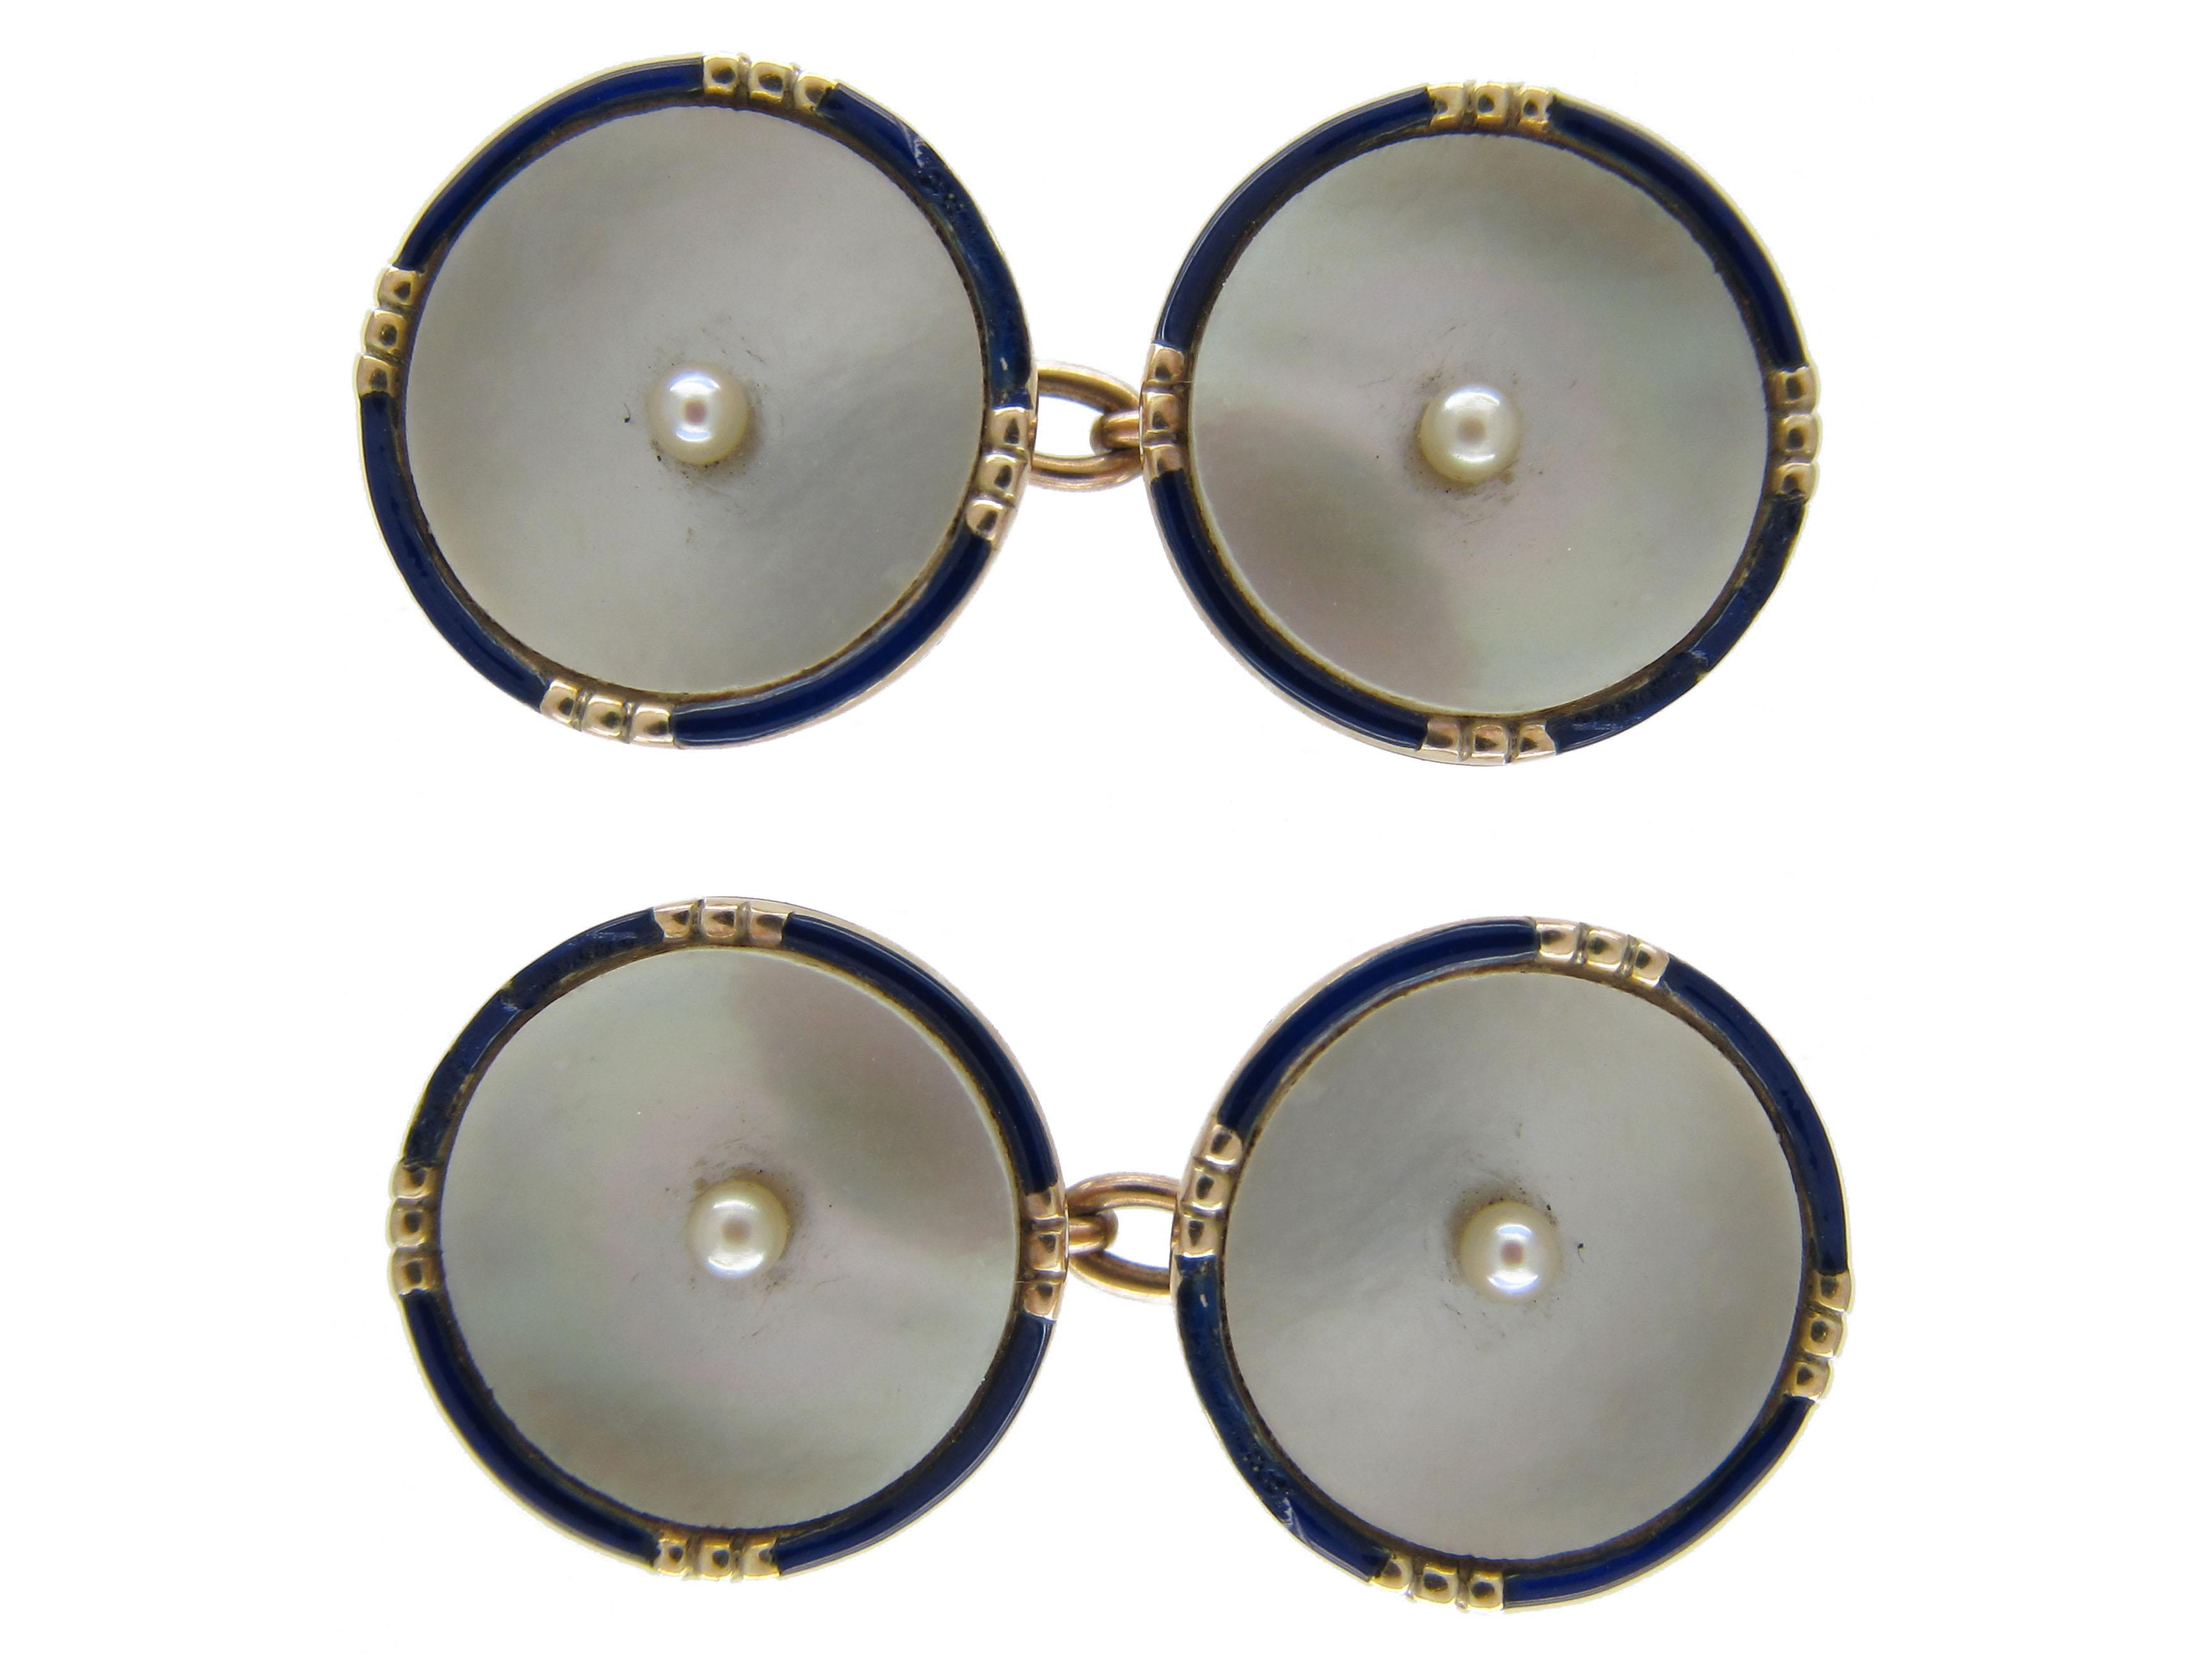 9ct Gold Mother of Pearl & Blue Enamel Cufflinks